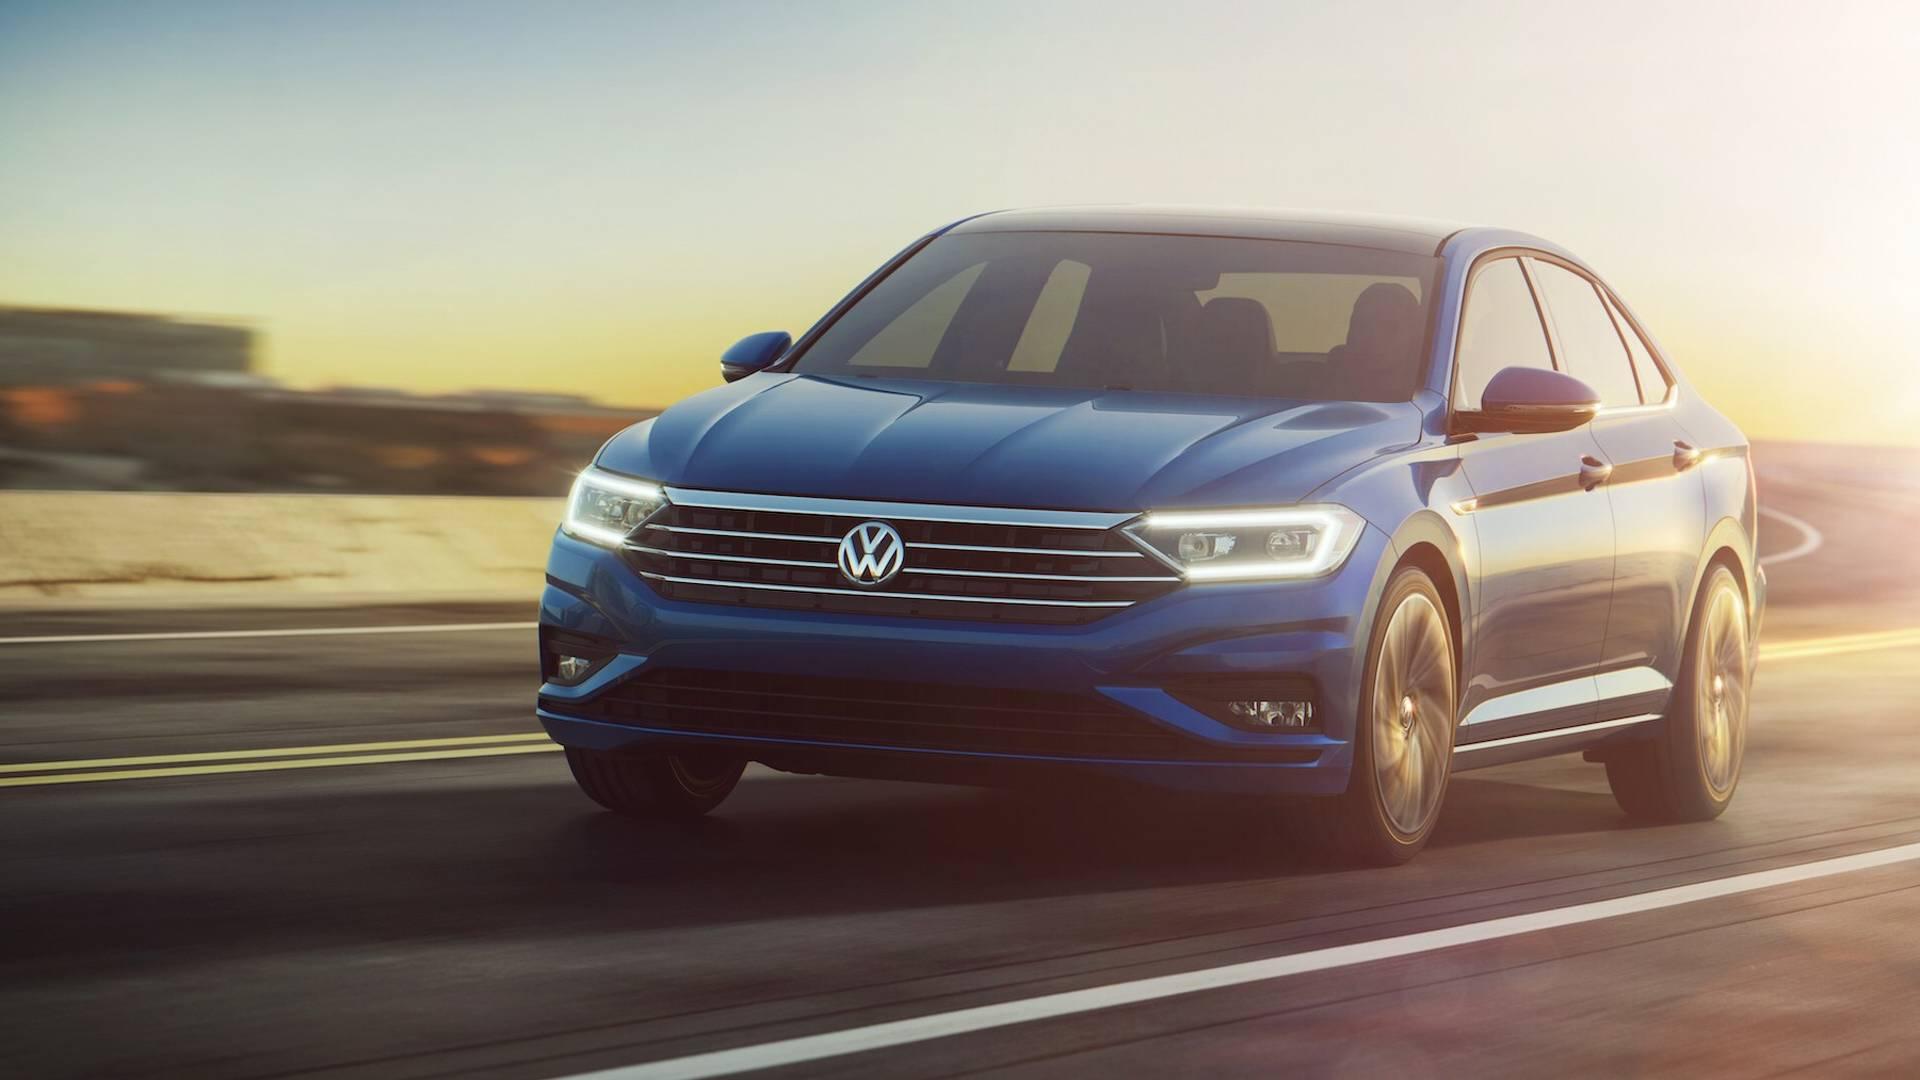 Volkswagen Las Vegas >> Volkswagen Goes for Bonneville Land Speed Record With Near-Production Jetta GLI - autoevolution